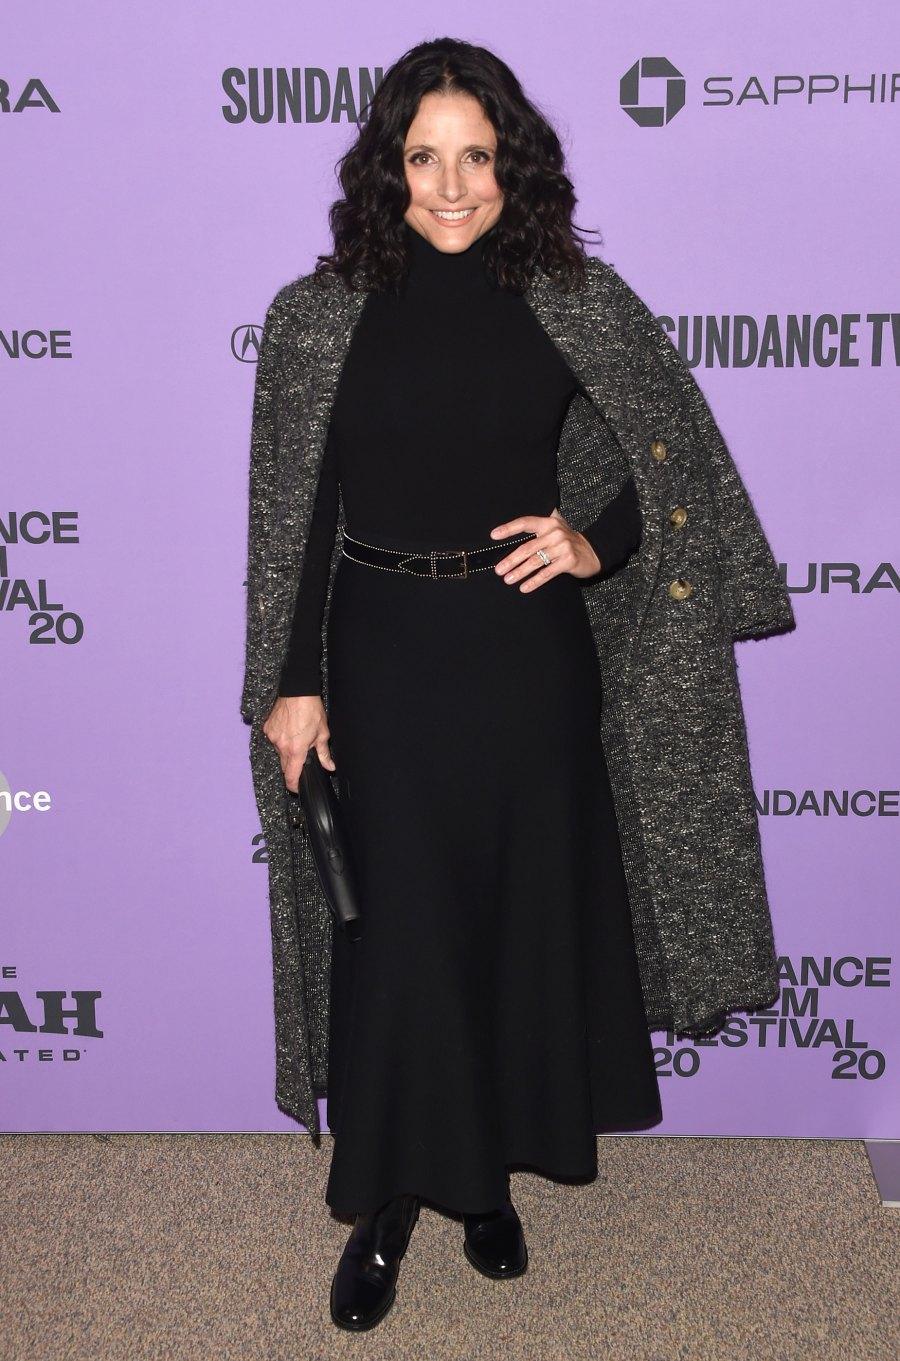 Celebs at Sundance Film Festival 2020 - Julia Louis-Dreyfus